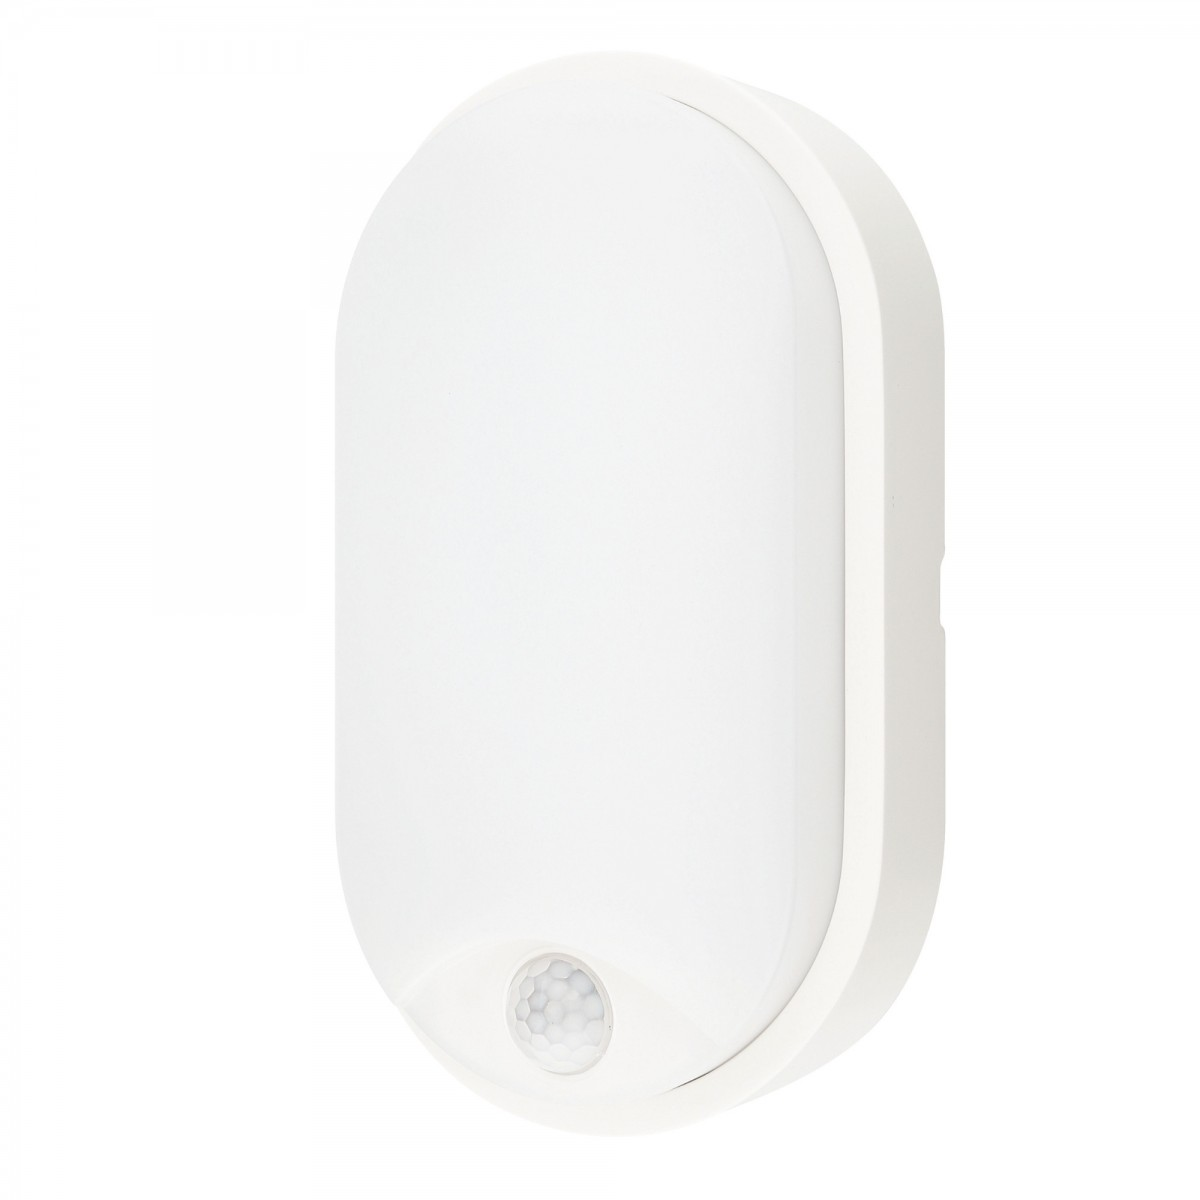 Plafonnier LED blanc A + 4000kelvin 14